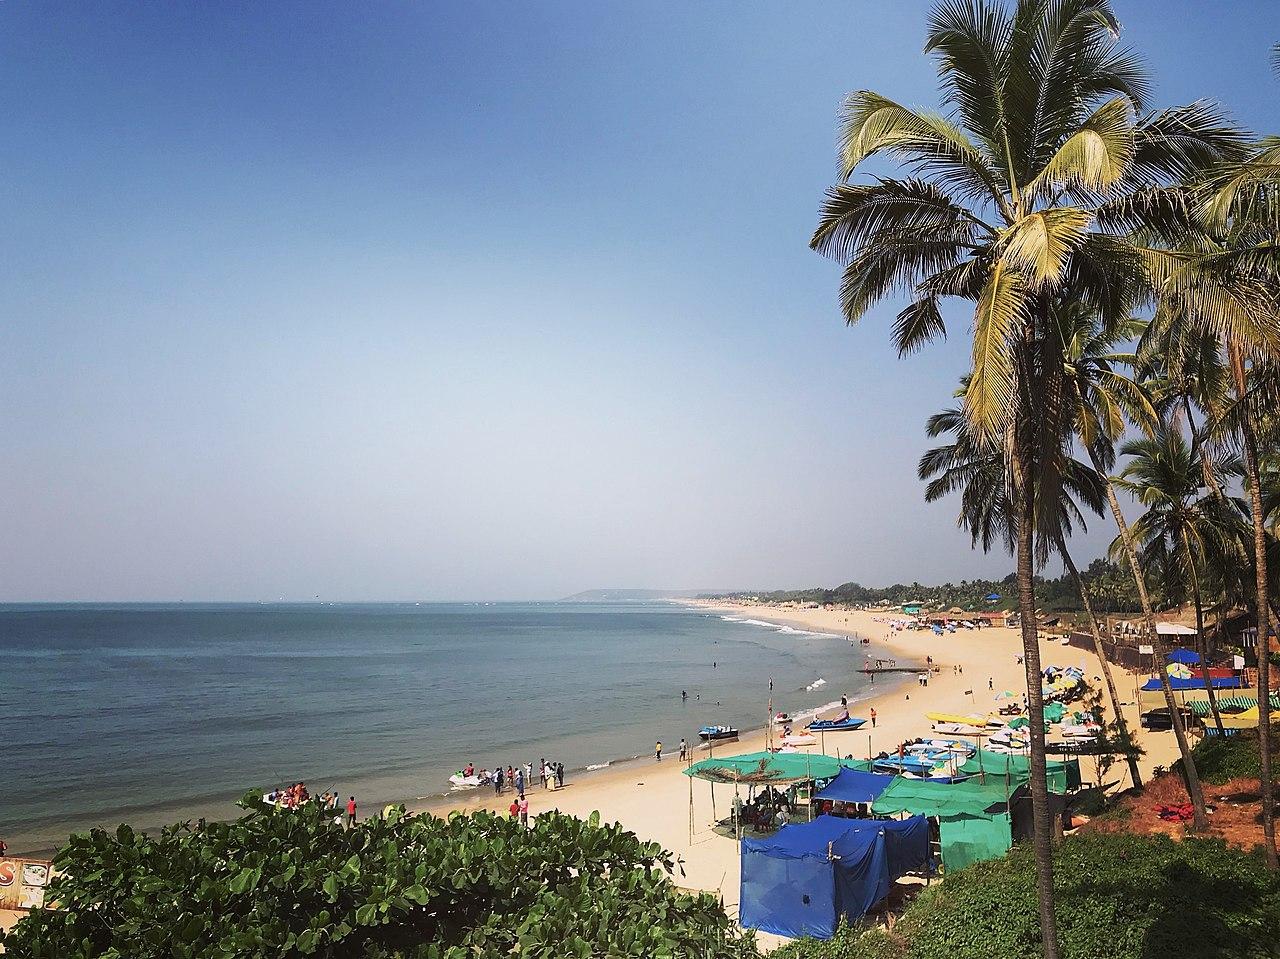 Sinquerim Beach - Amazing Beach in Goa For Watching Dolphins